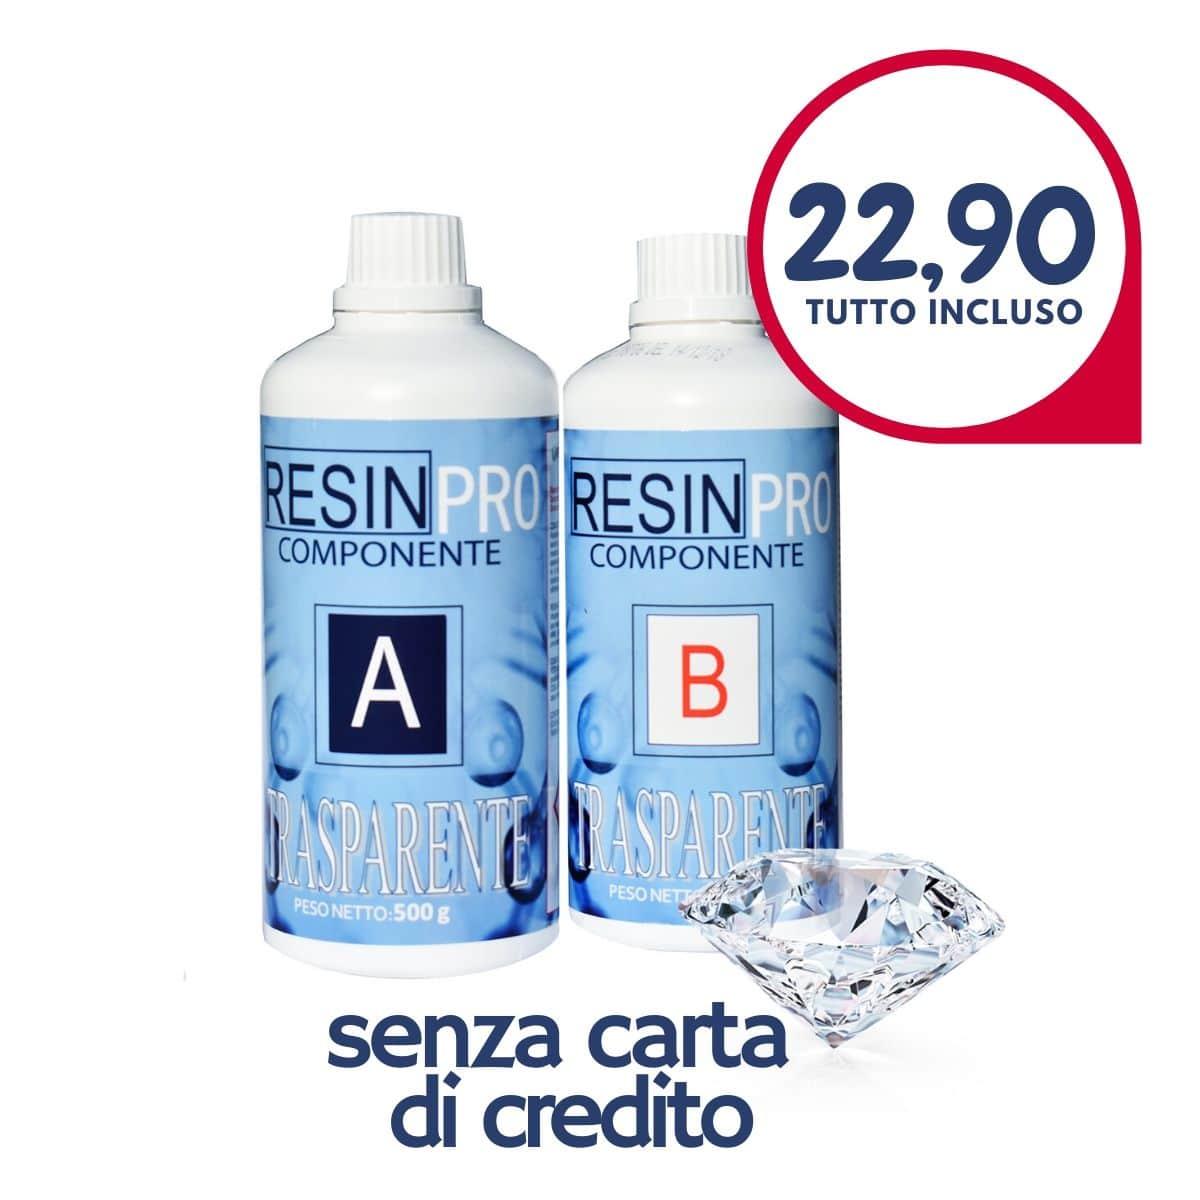 OFFERTA La resina epossidica trasparente atossica 22,90 EUR